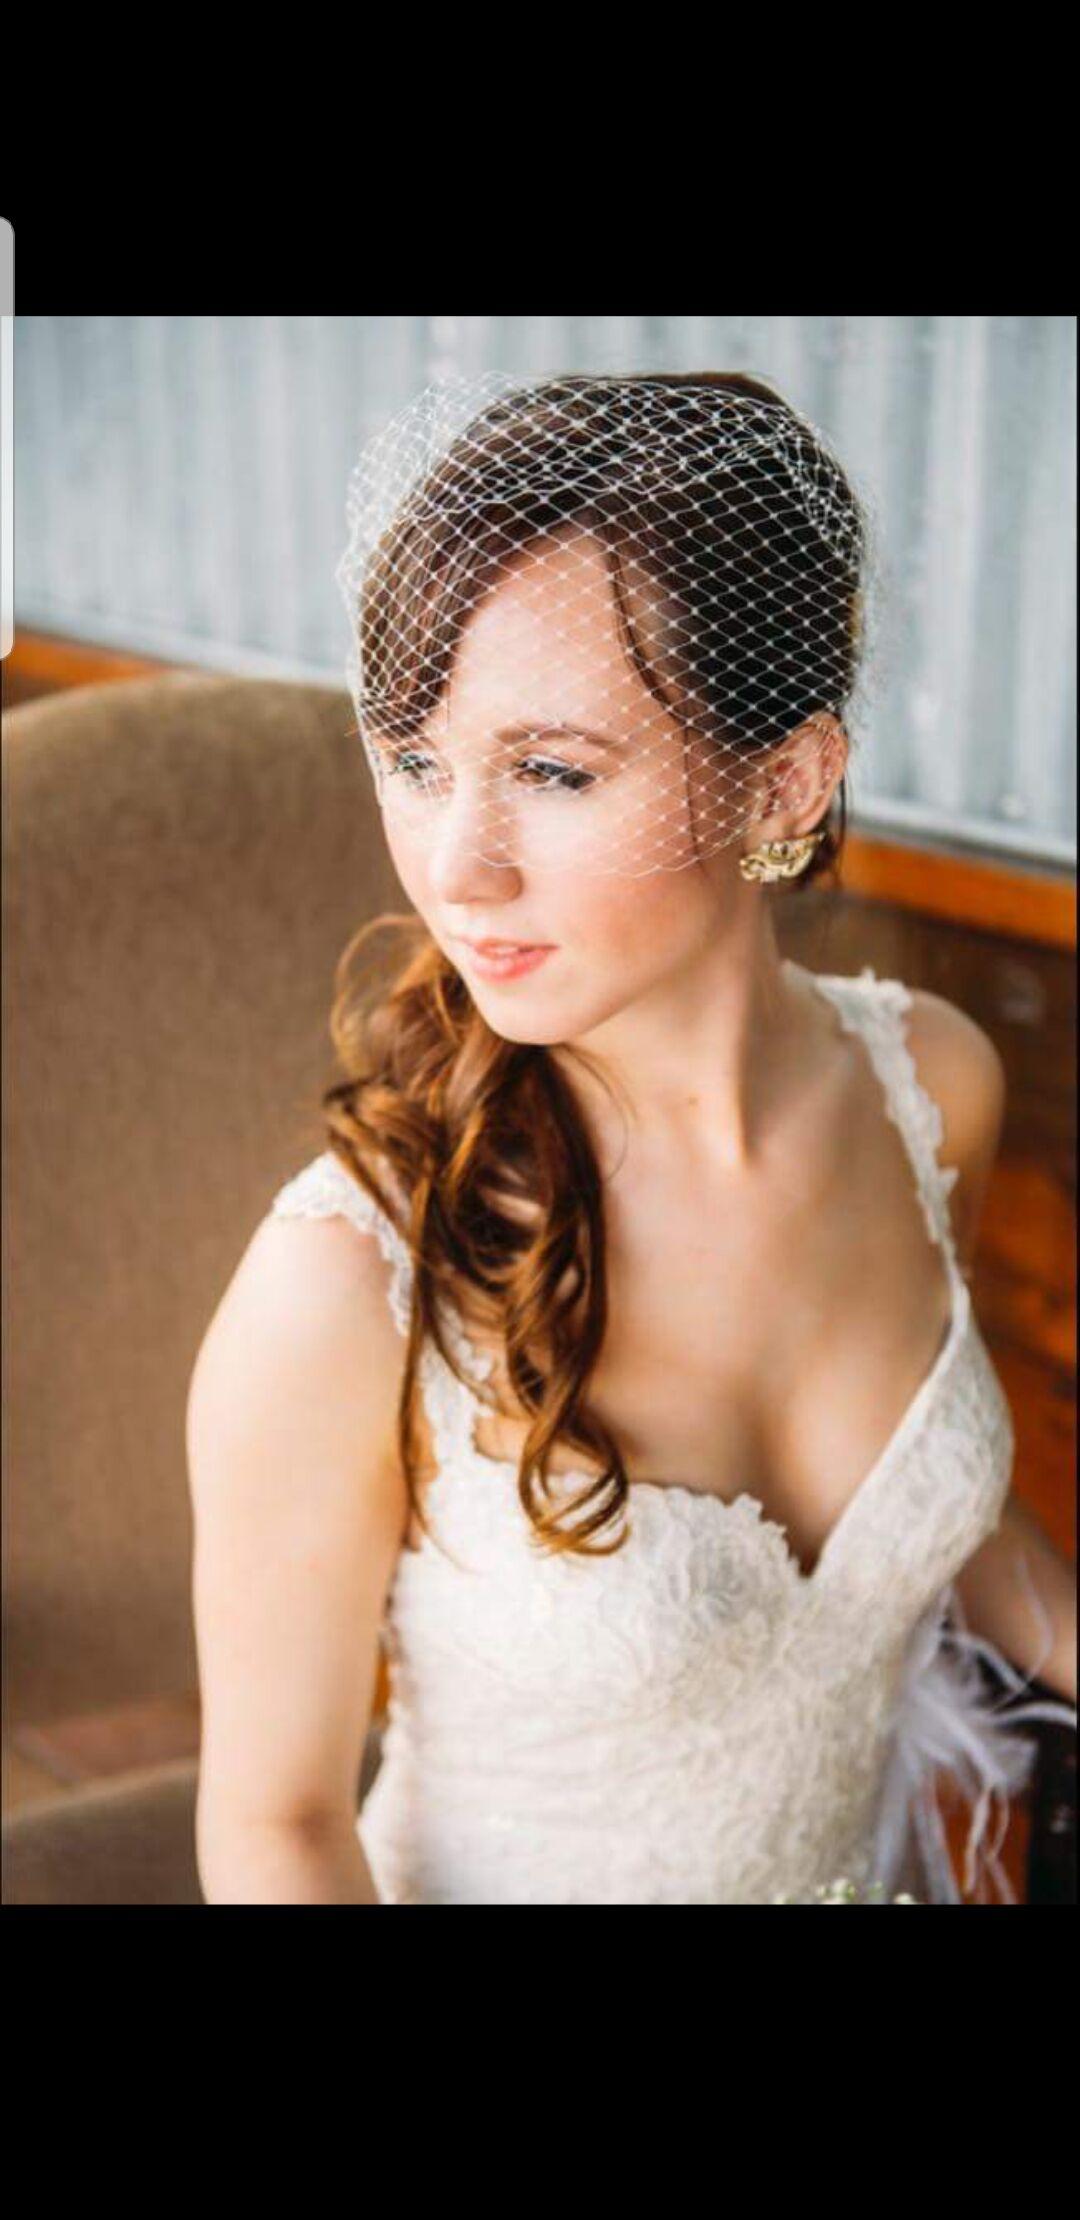 bridal hair and makeup cincinnati ohio | kakaozzank.co